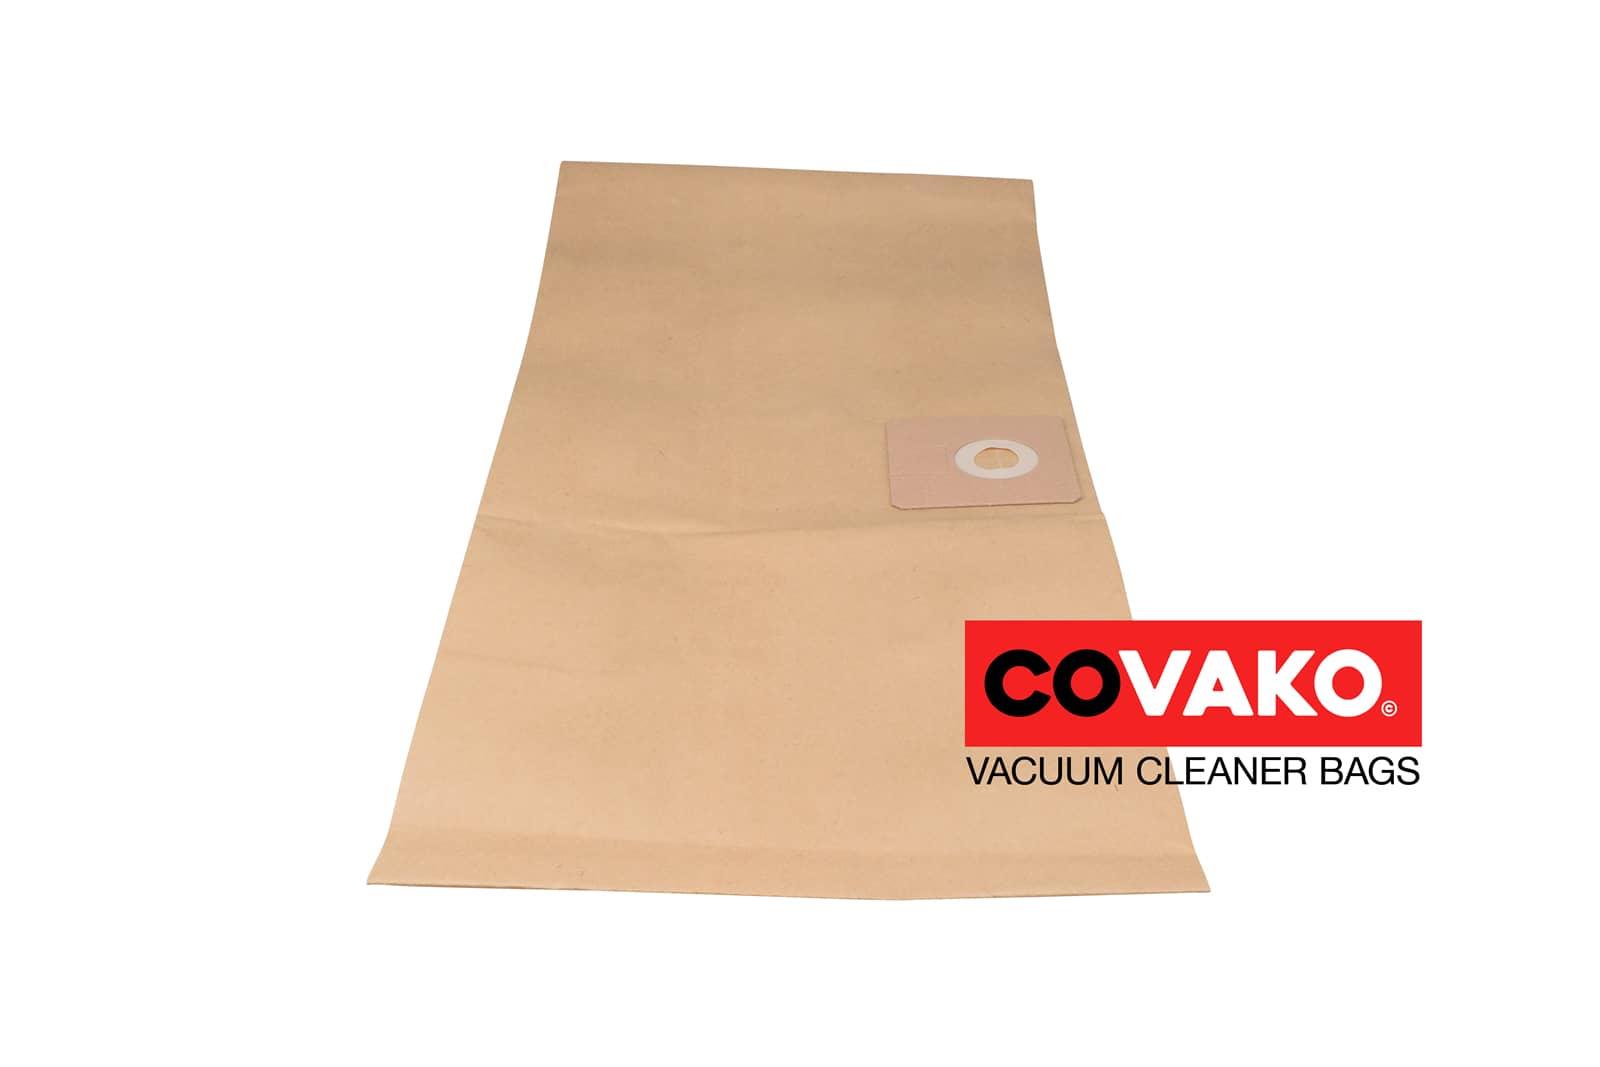 I-vac 25 Eco plus / Papier - I-vac Staubsaugerbeutel